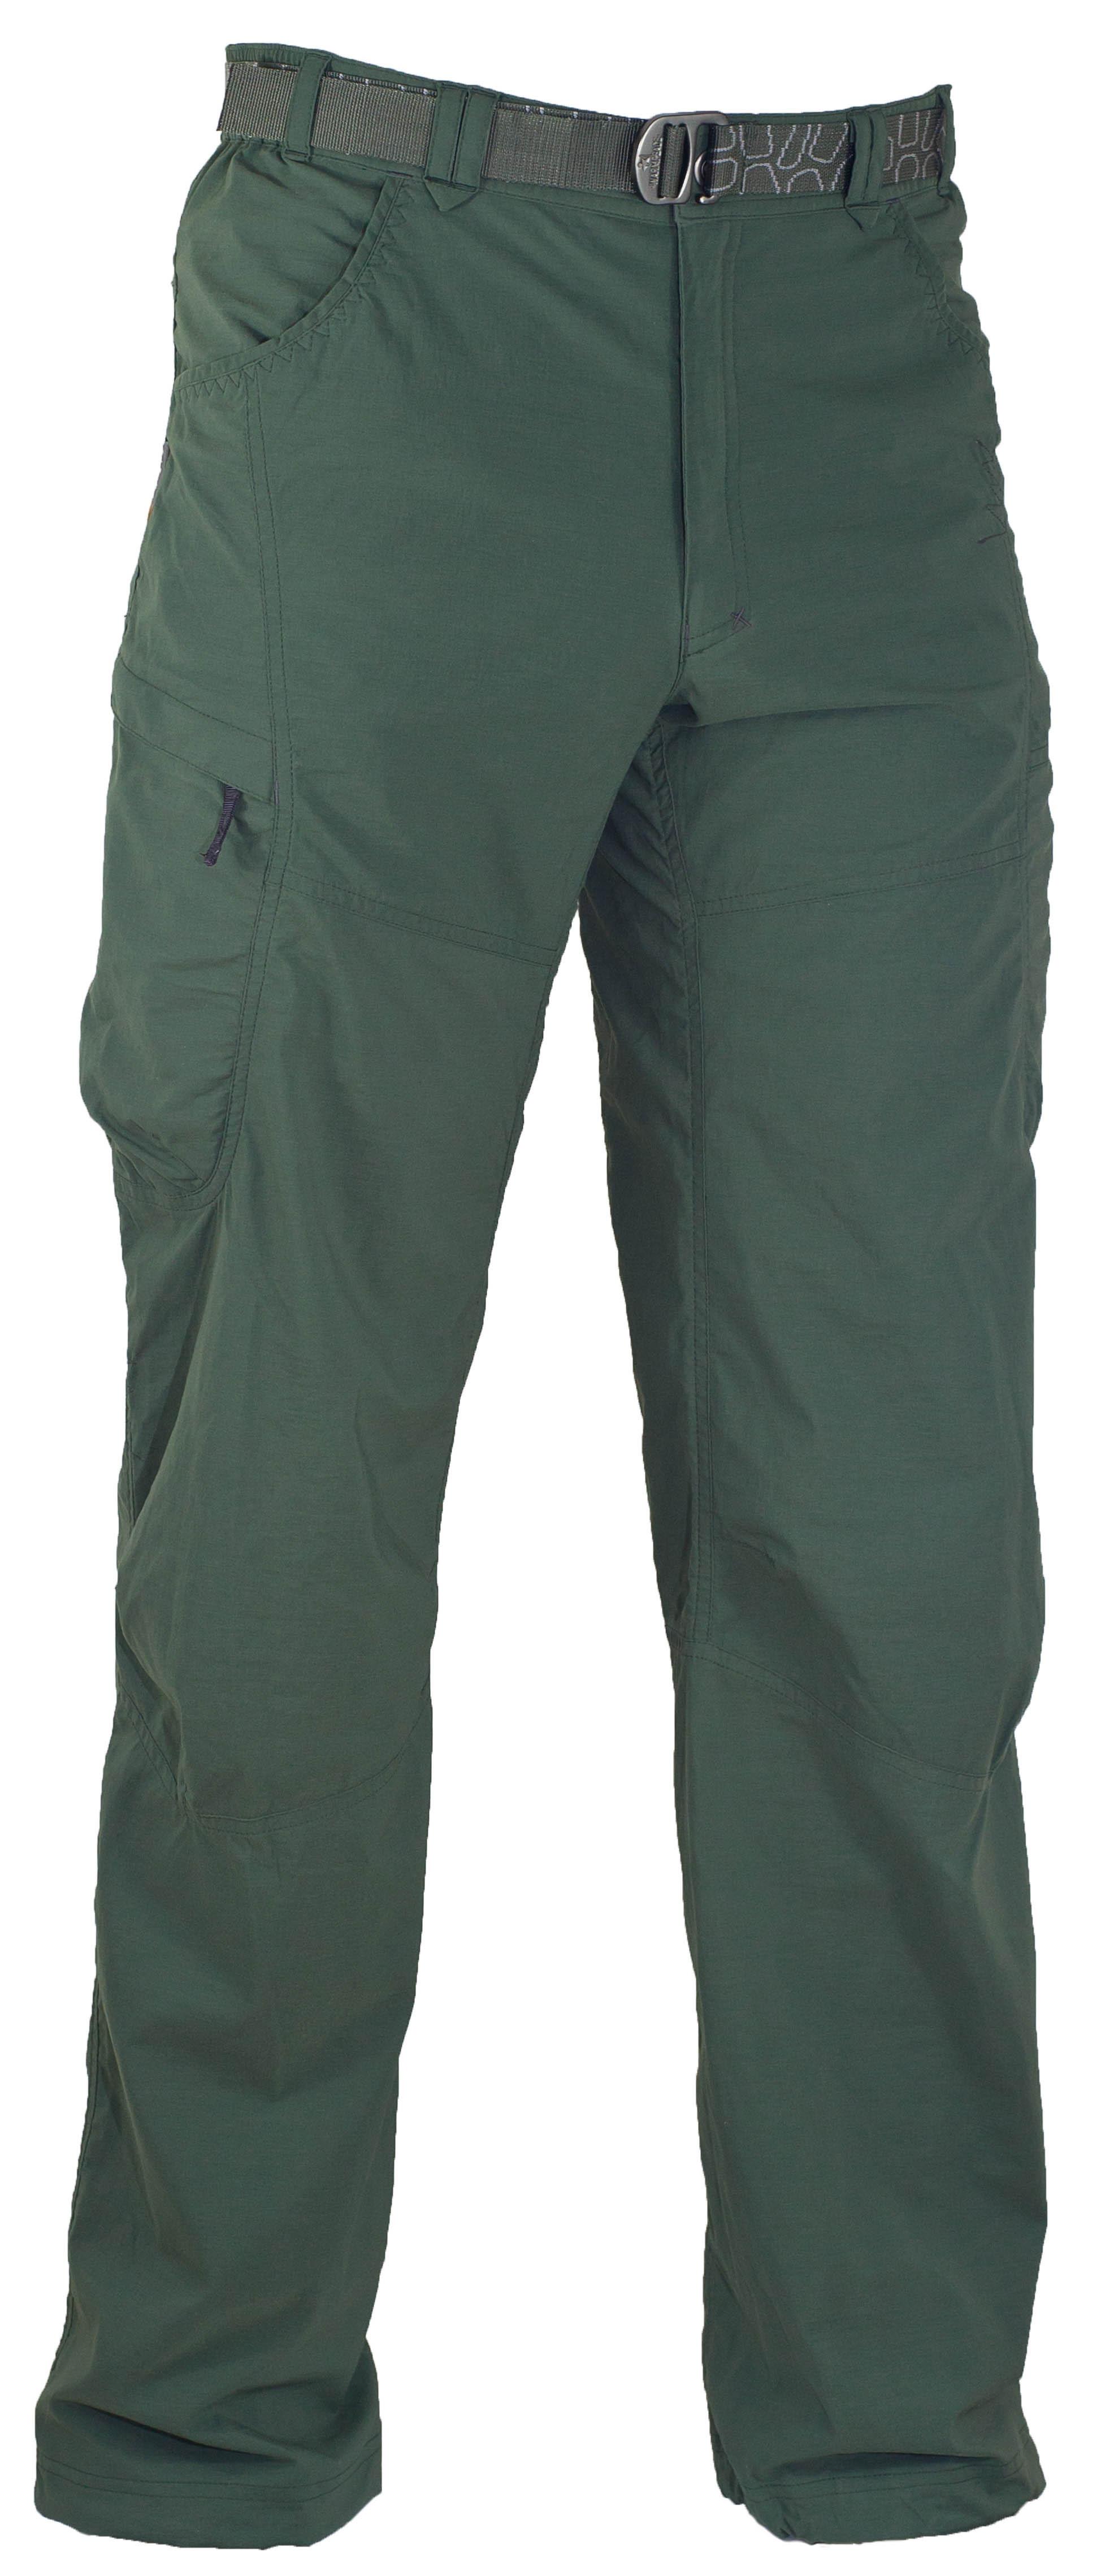 Pantaloni Warmpeace Corsar - Verde